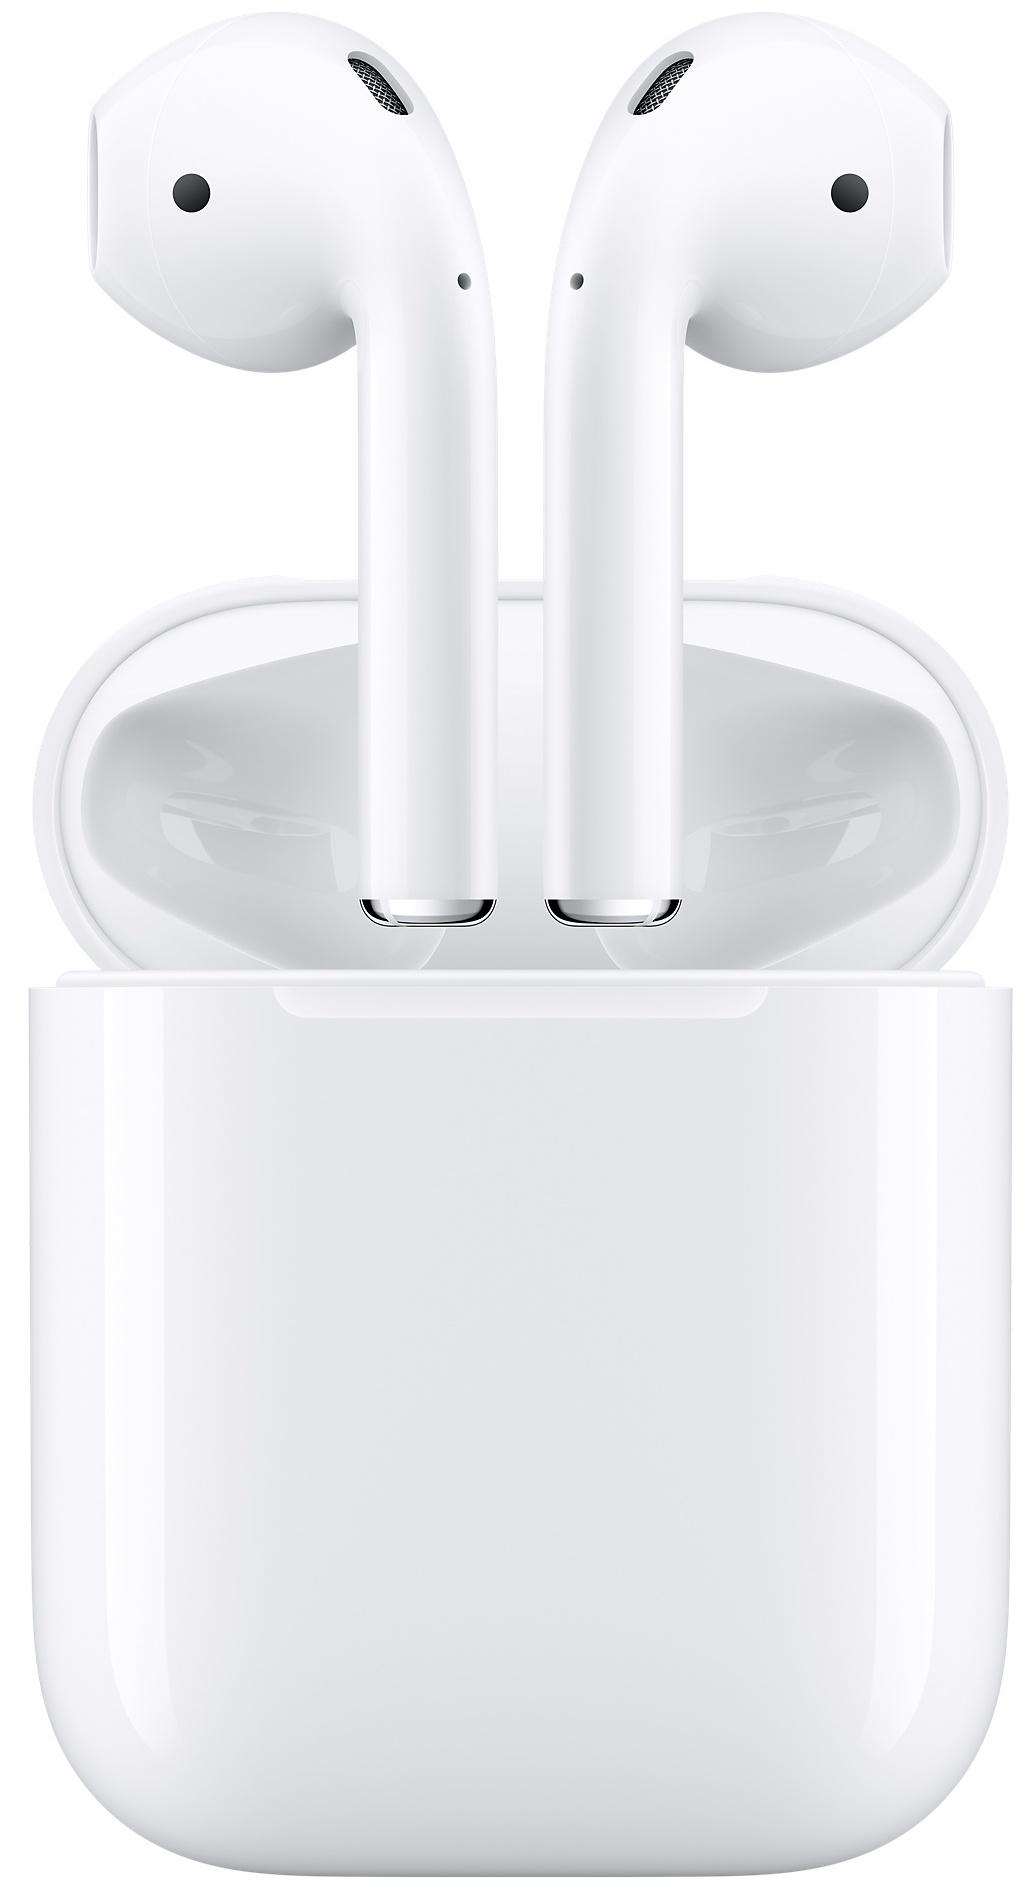 Offerta Apple AirPods 2 su TrovaUsati.it